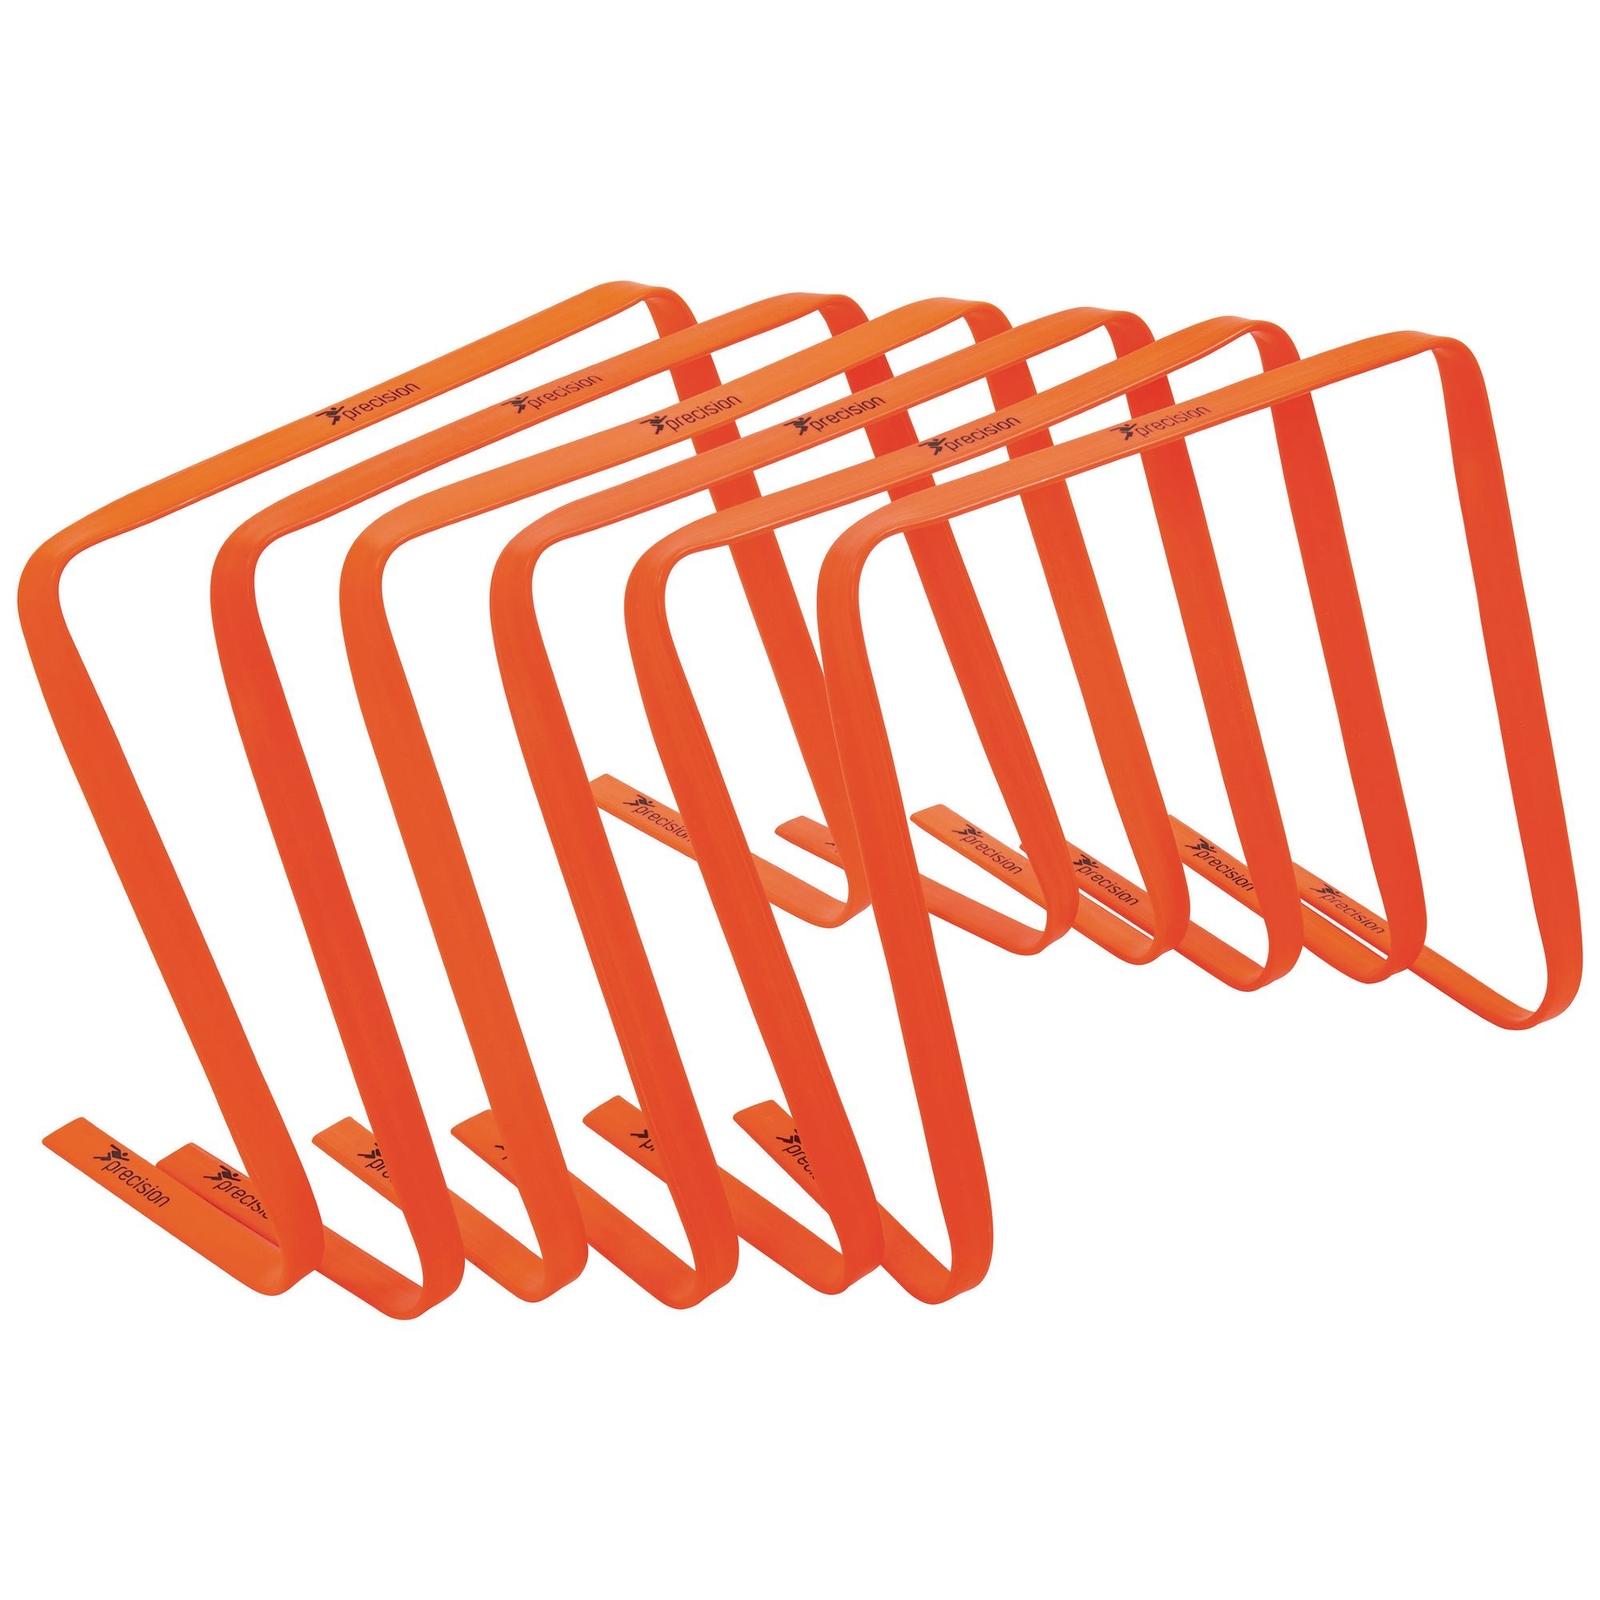 Precision Flat Hurdles - 15in - Orange